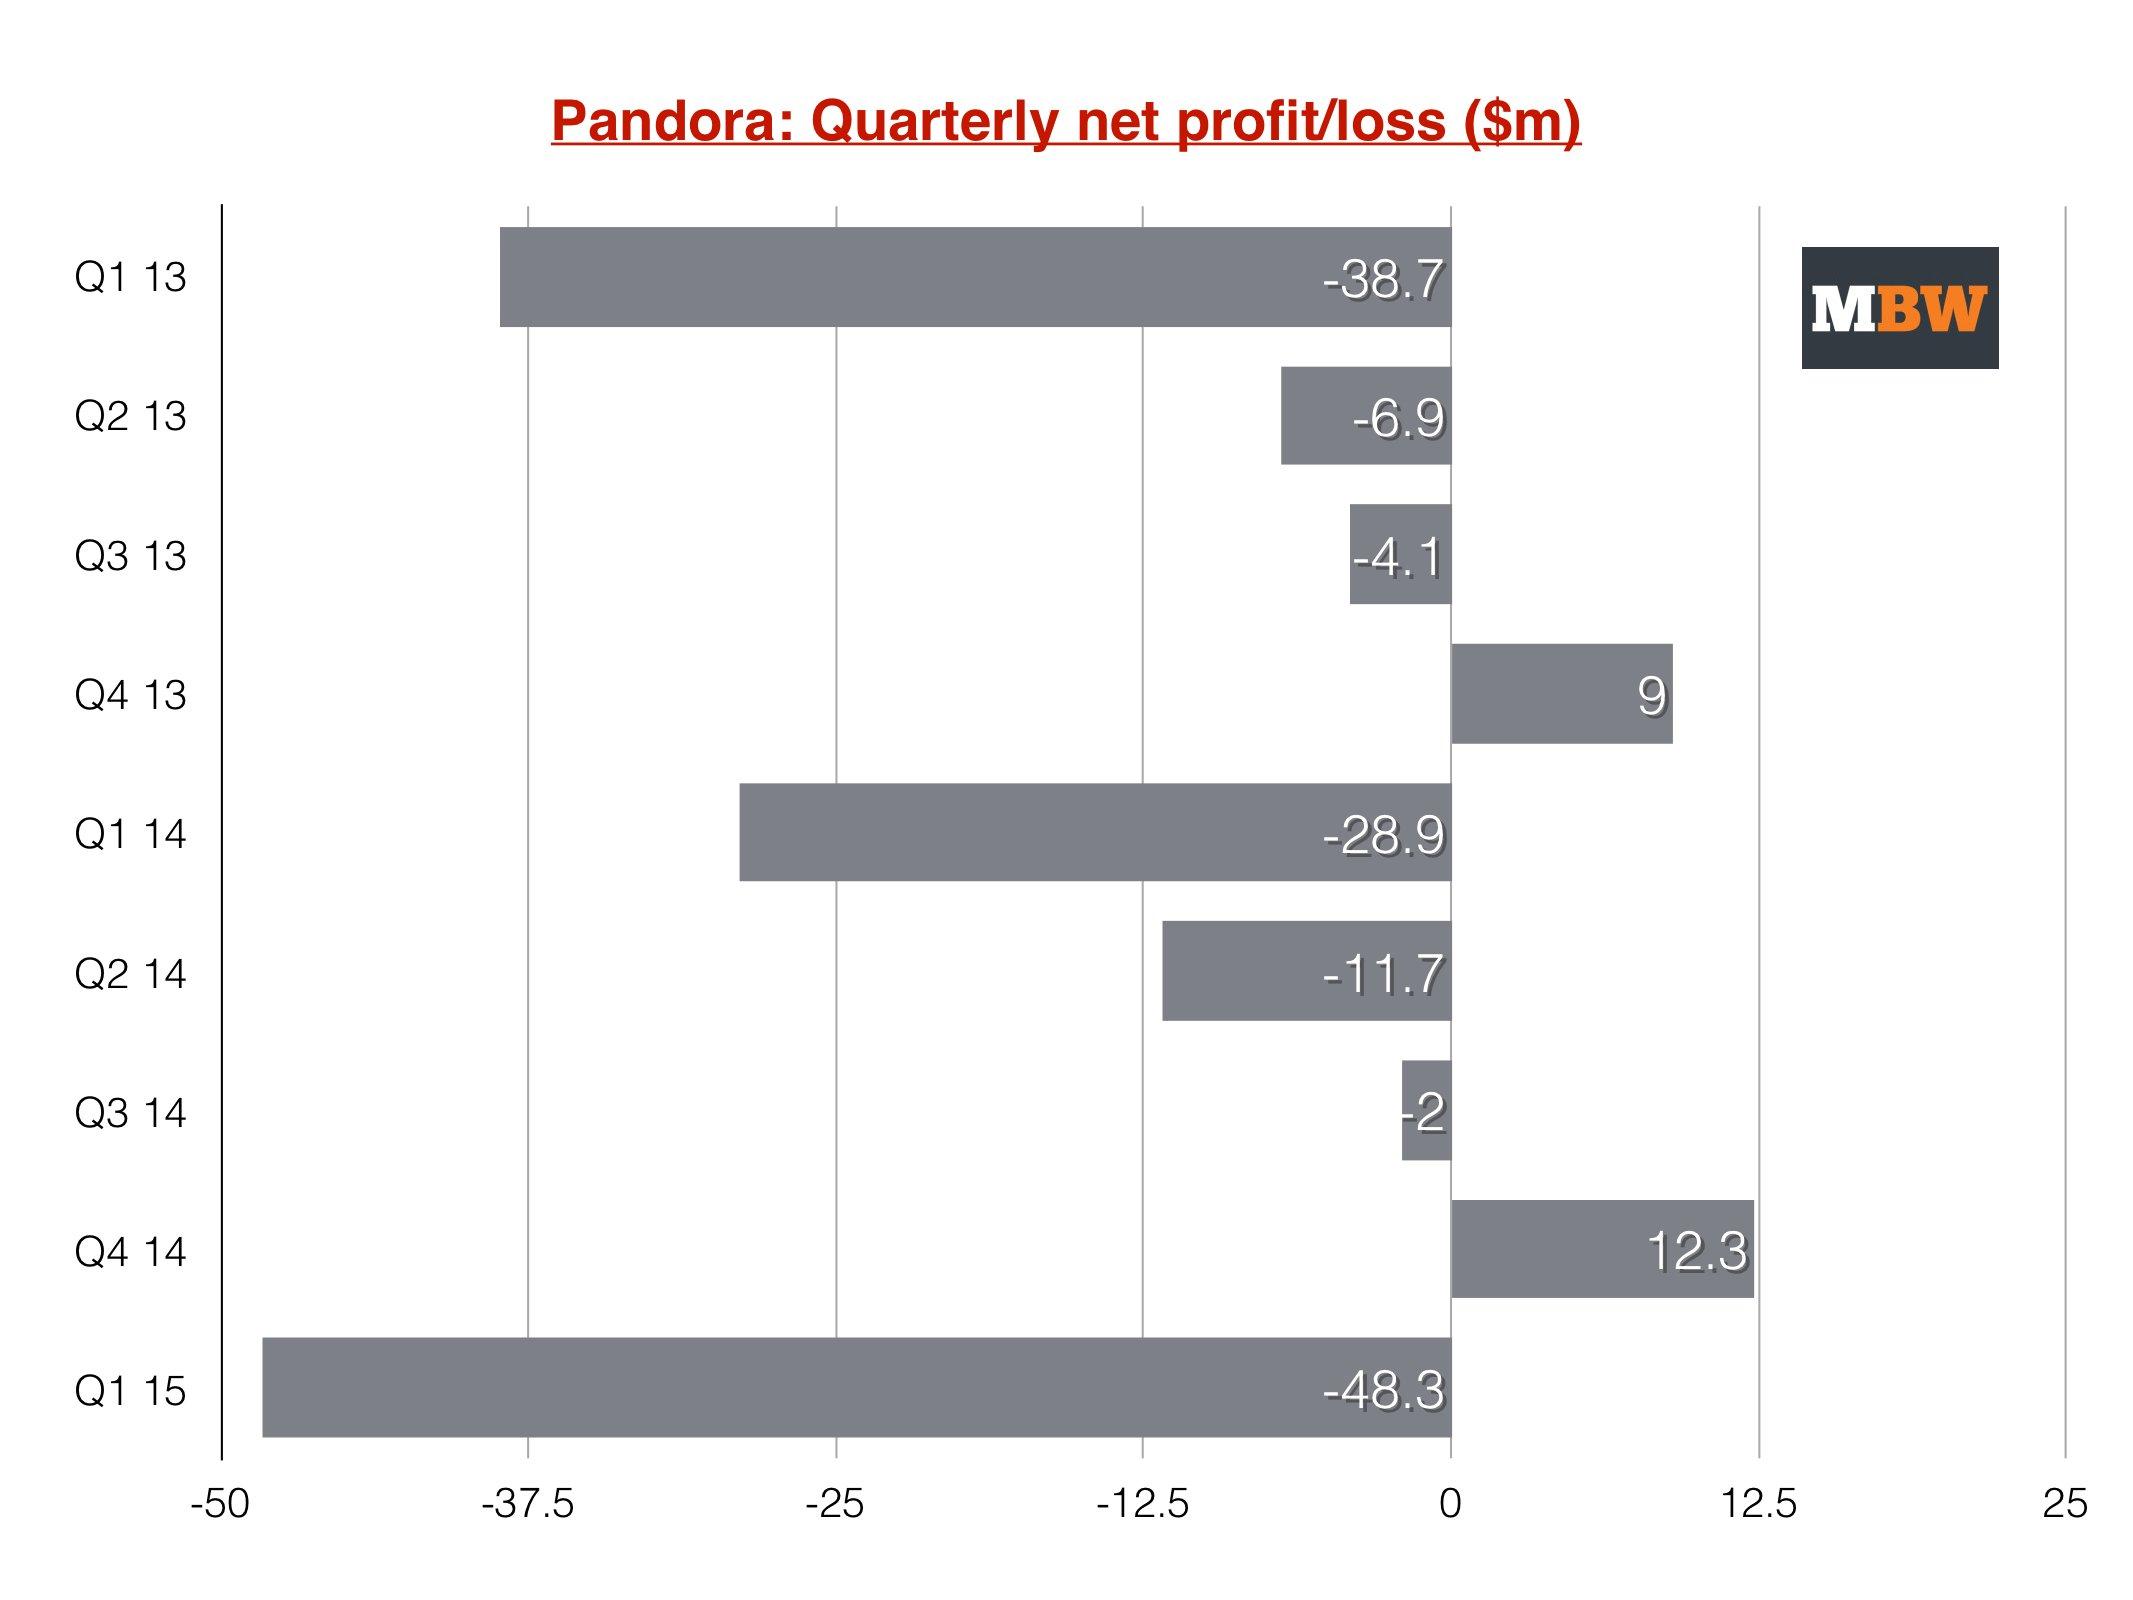 Pandoralosses